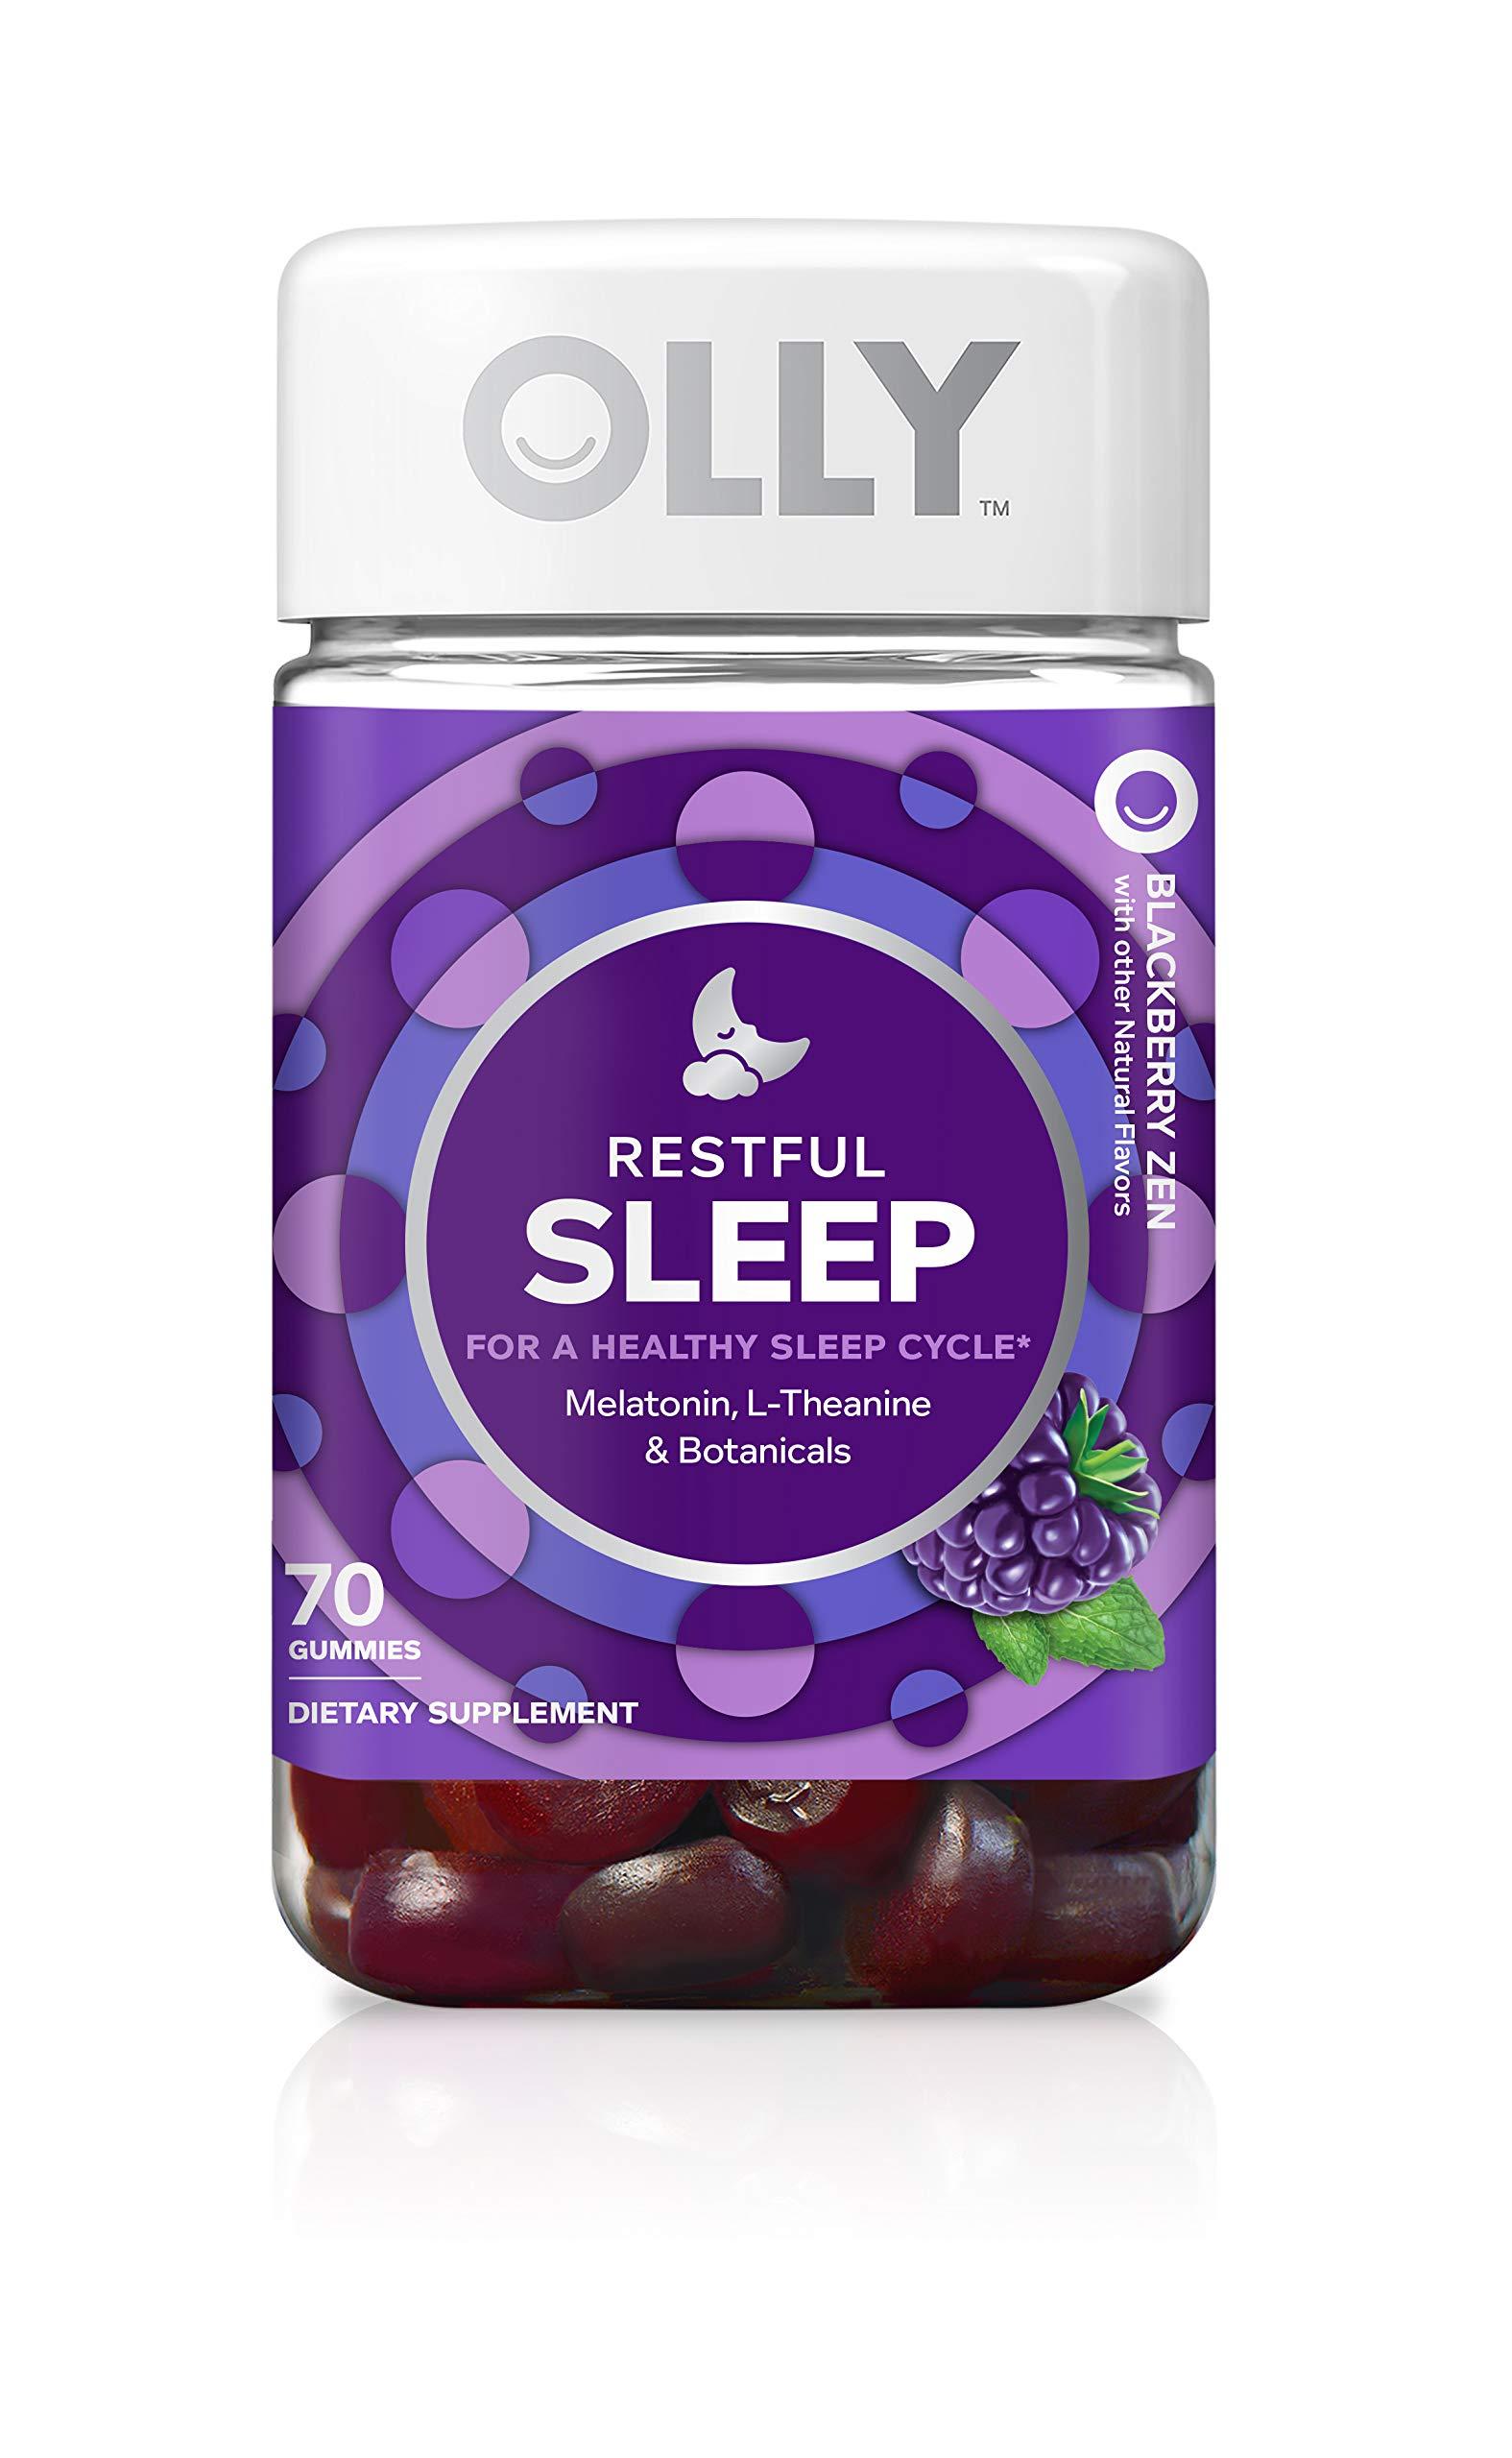 OLLY Restful Sleep Melatonin Gummy, 35 Day Supply (70 Gummies), BlackBerry Zen, L Theanine, Chamomile, Lemon Balm, Chewable Supplement by Olly (Image #1)